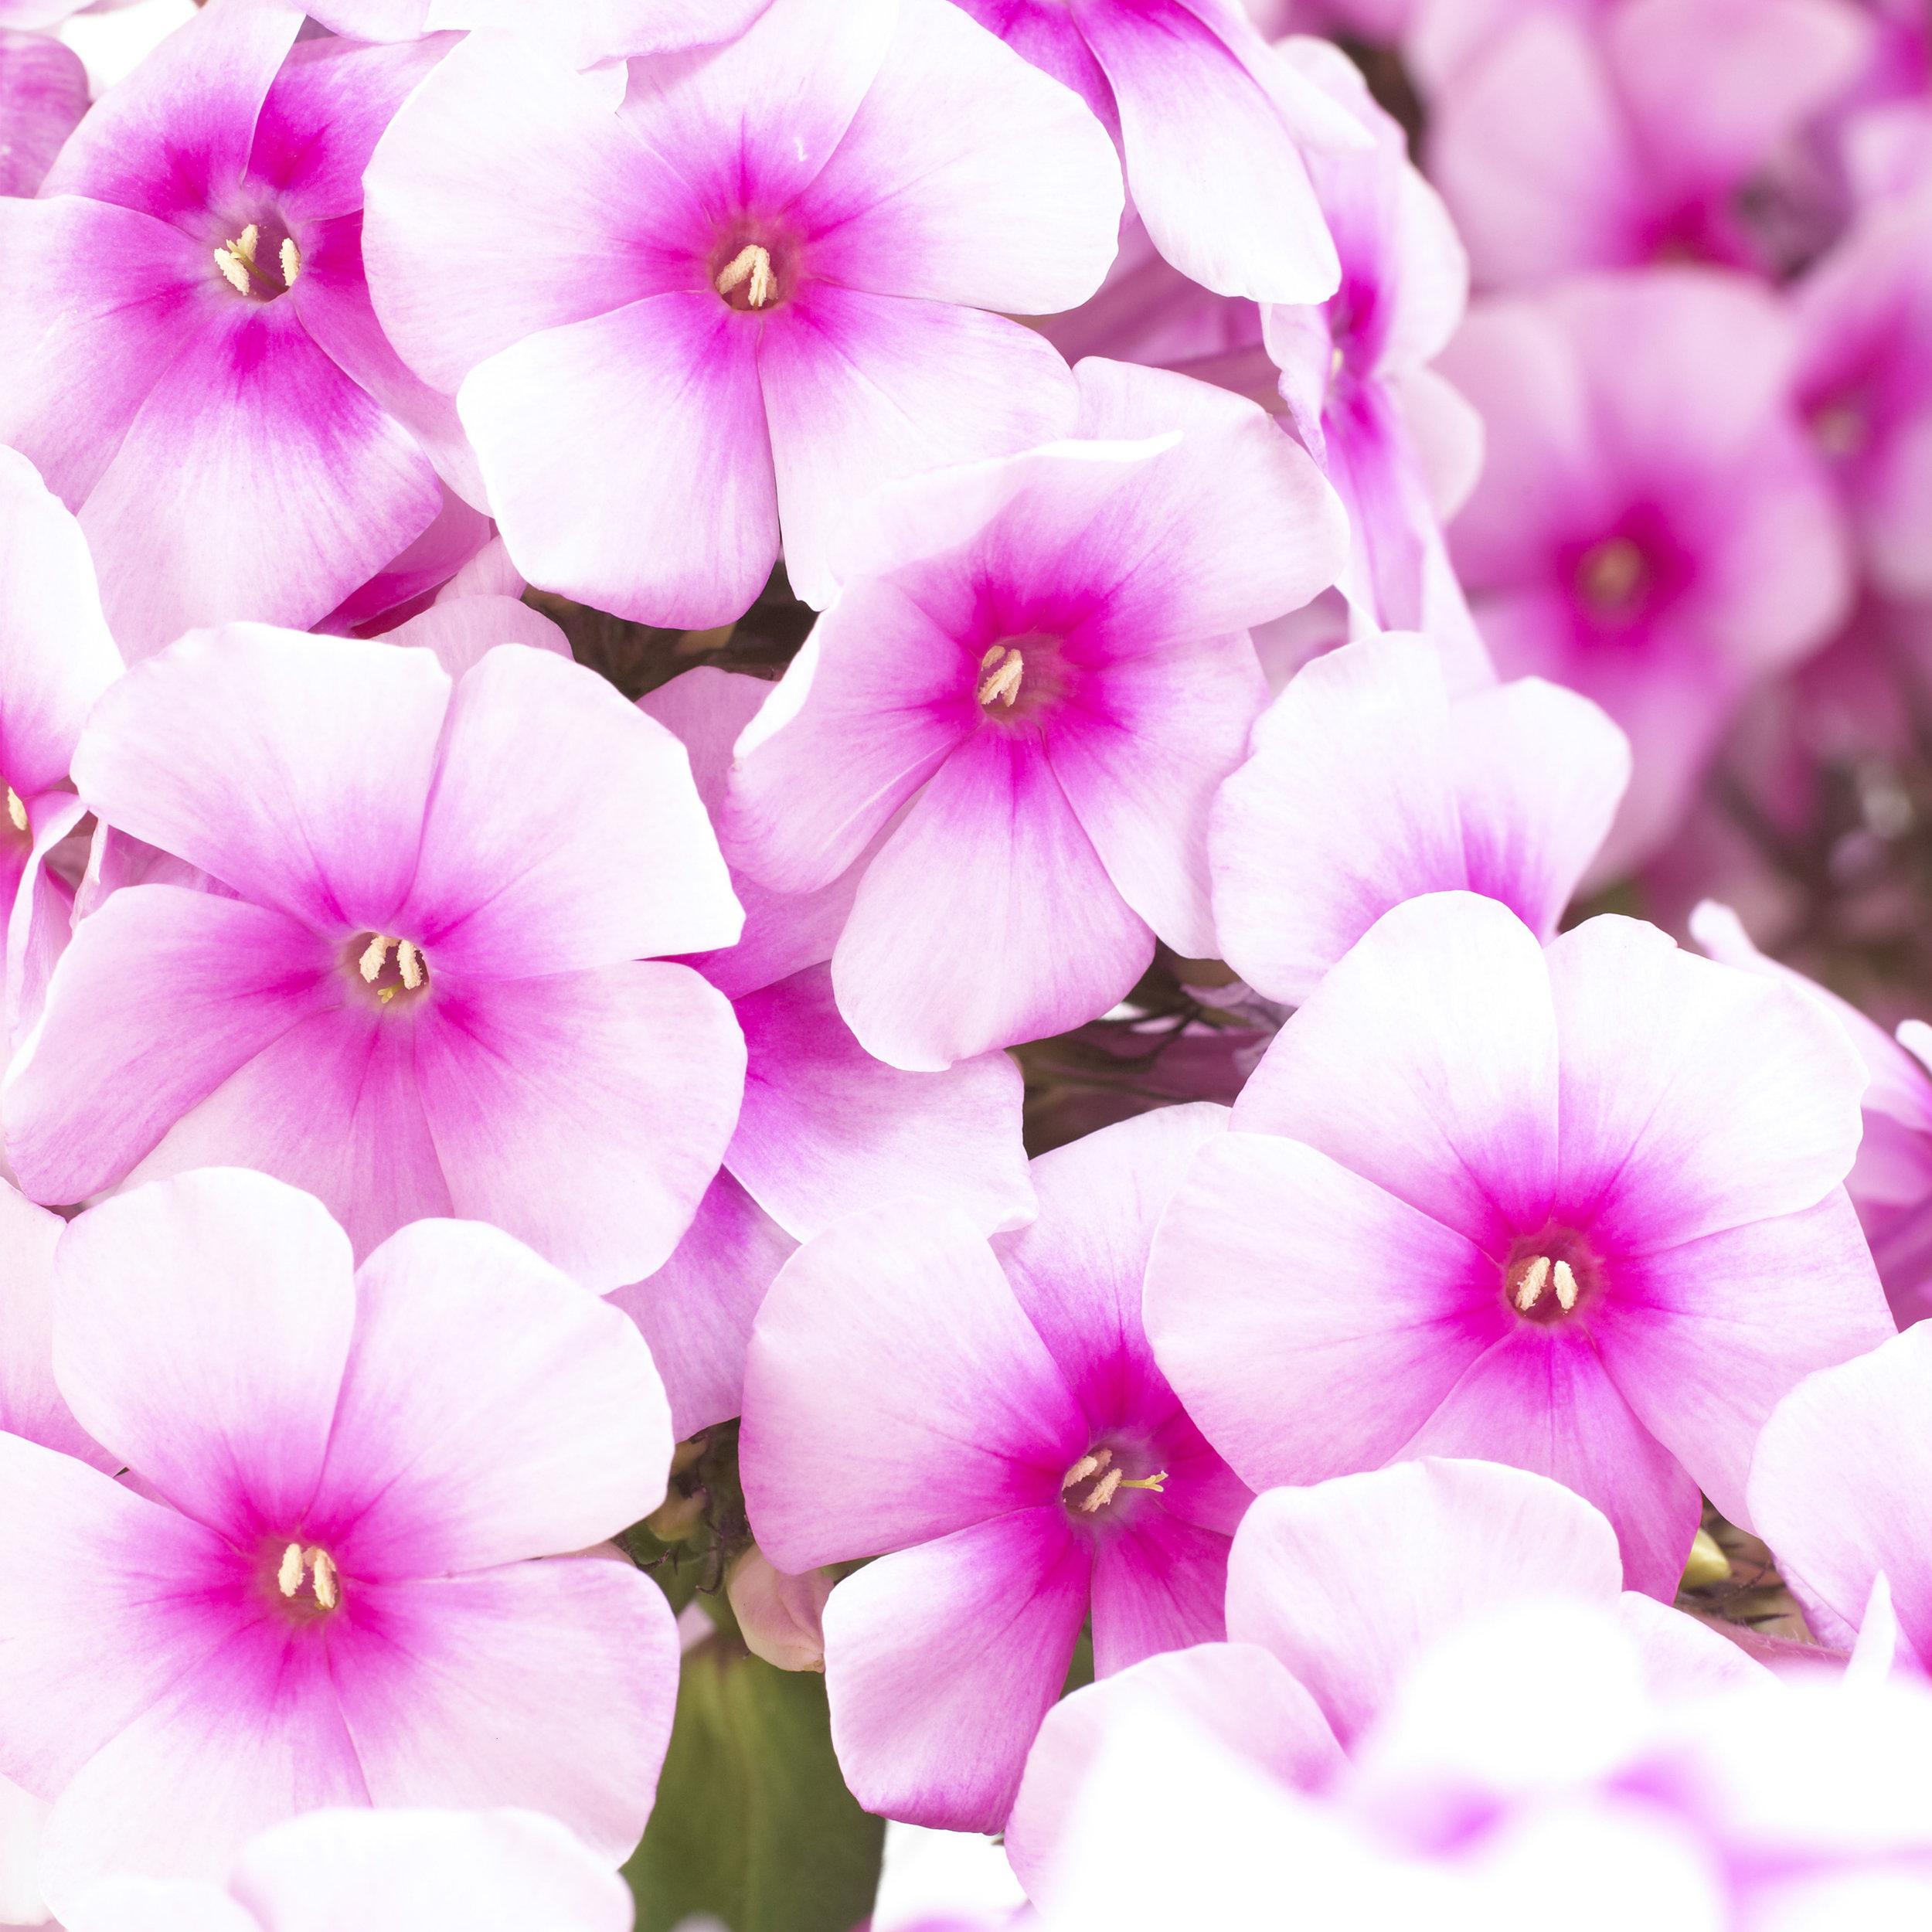 HR_Vegetative_Phlox_Sweet_Summer_Sweet_Summer_Festival__Compact_Rose_Dark_Eye_70028300.jpg